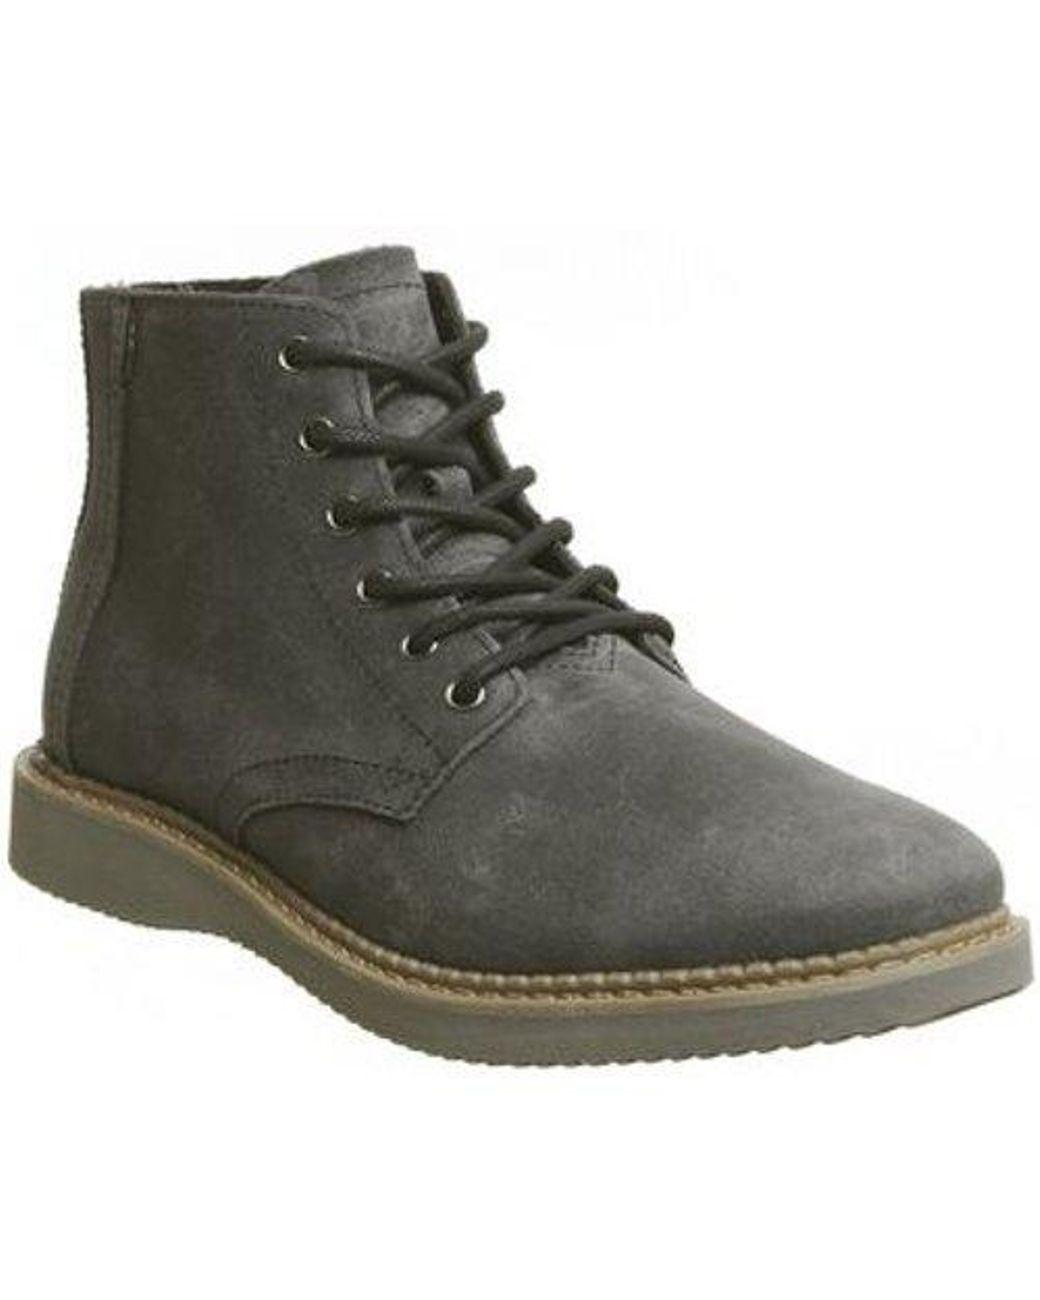 5ba62fa3591 TOMS Porter Boot in Black for Men - Lyst